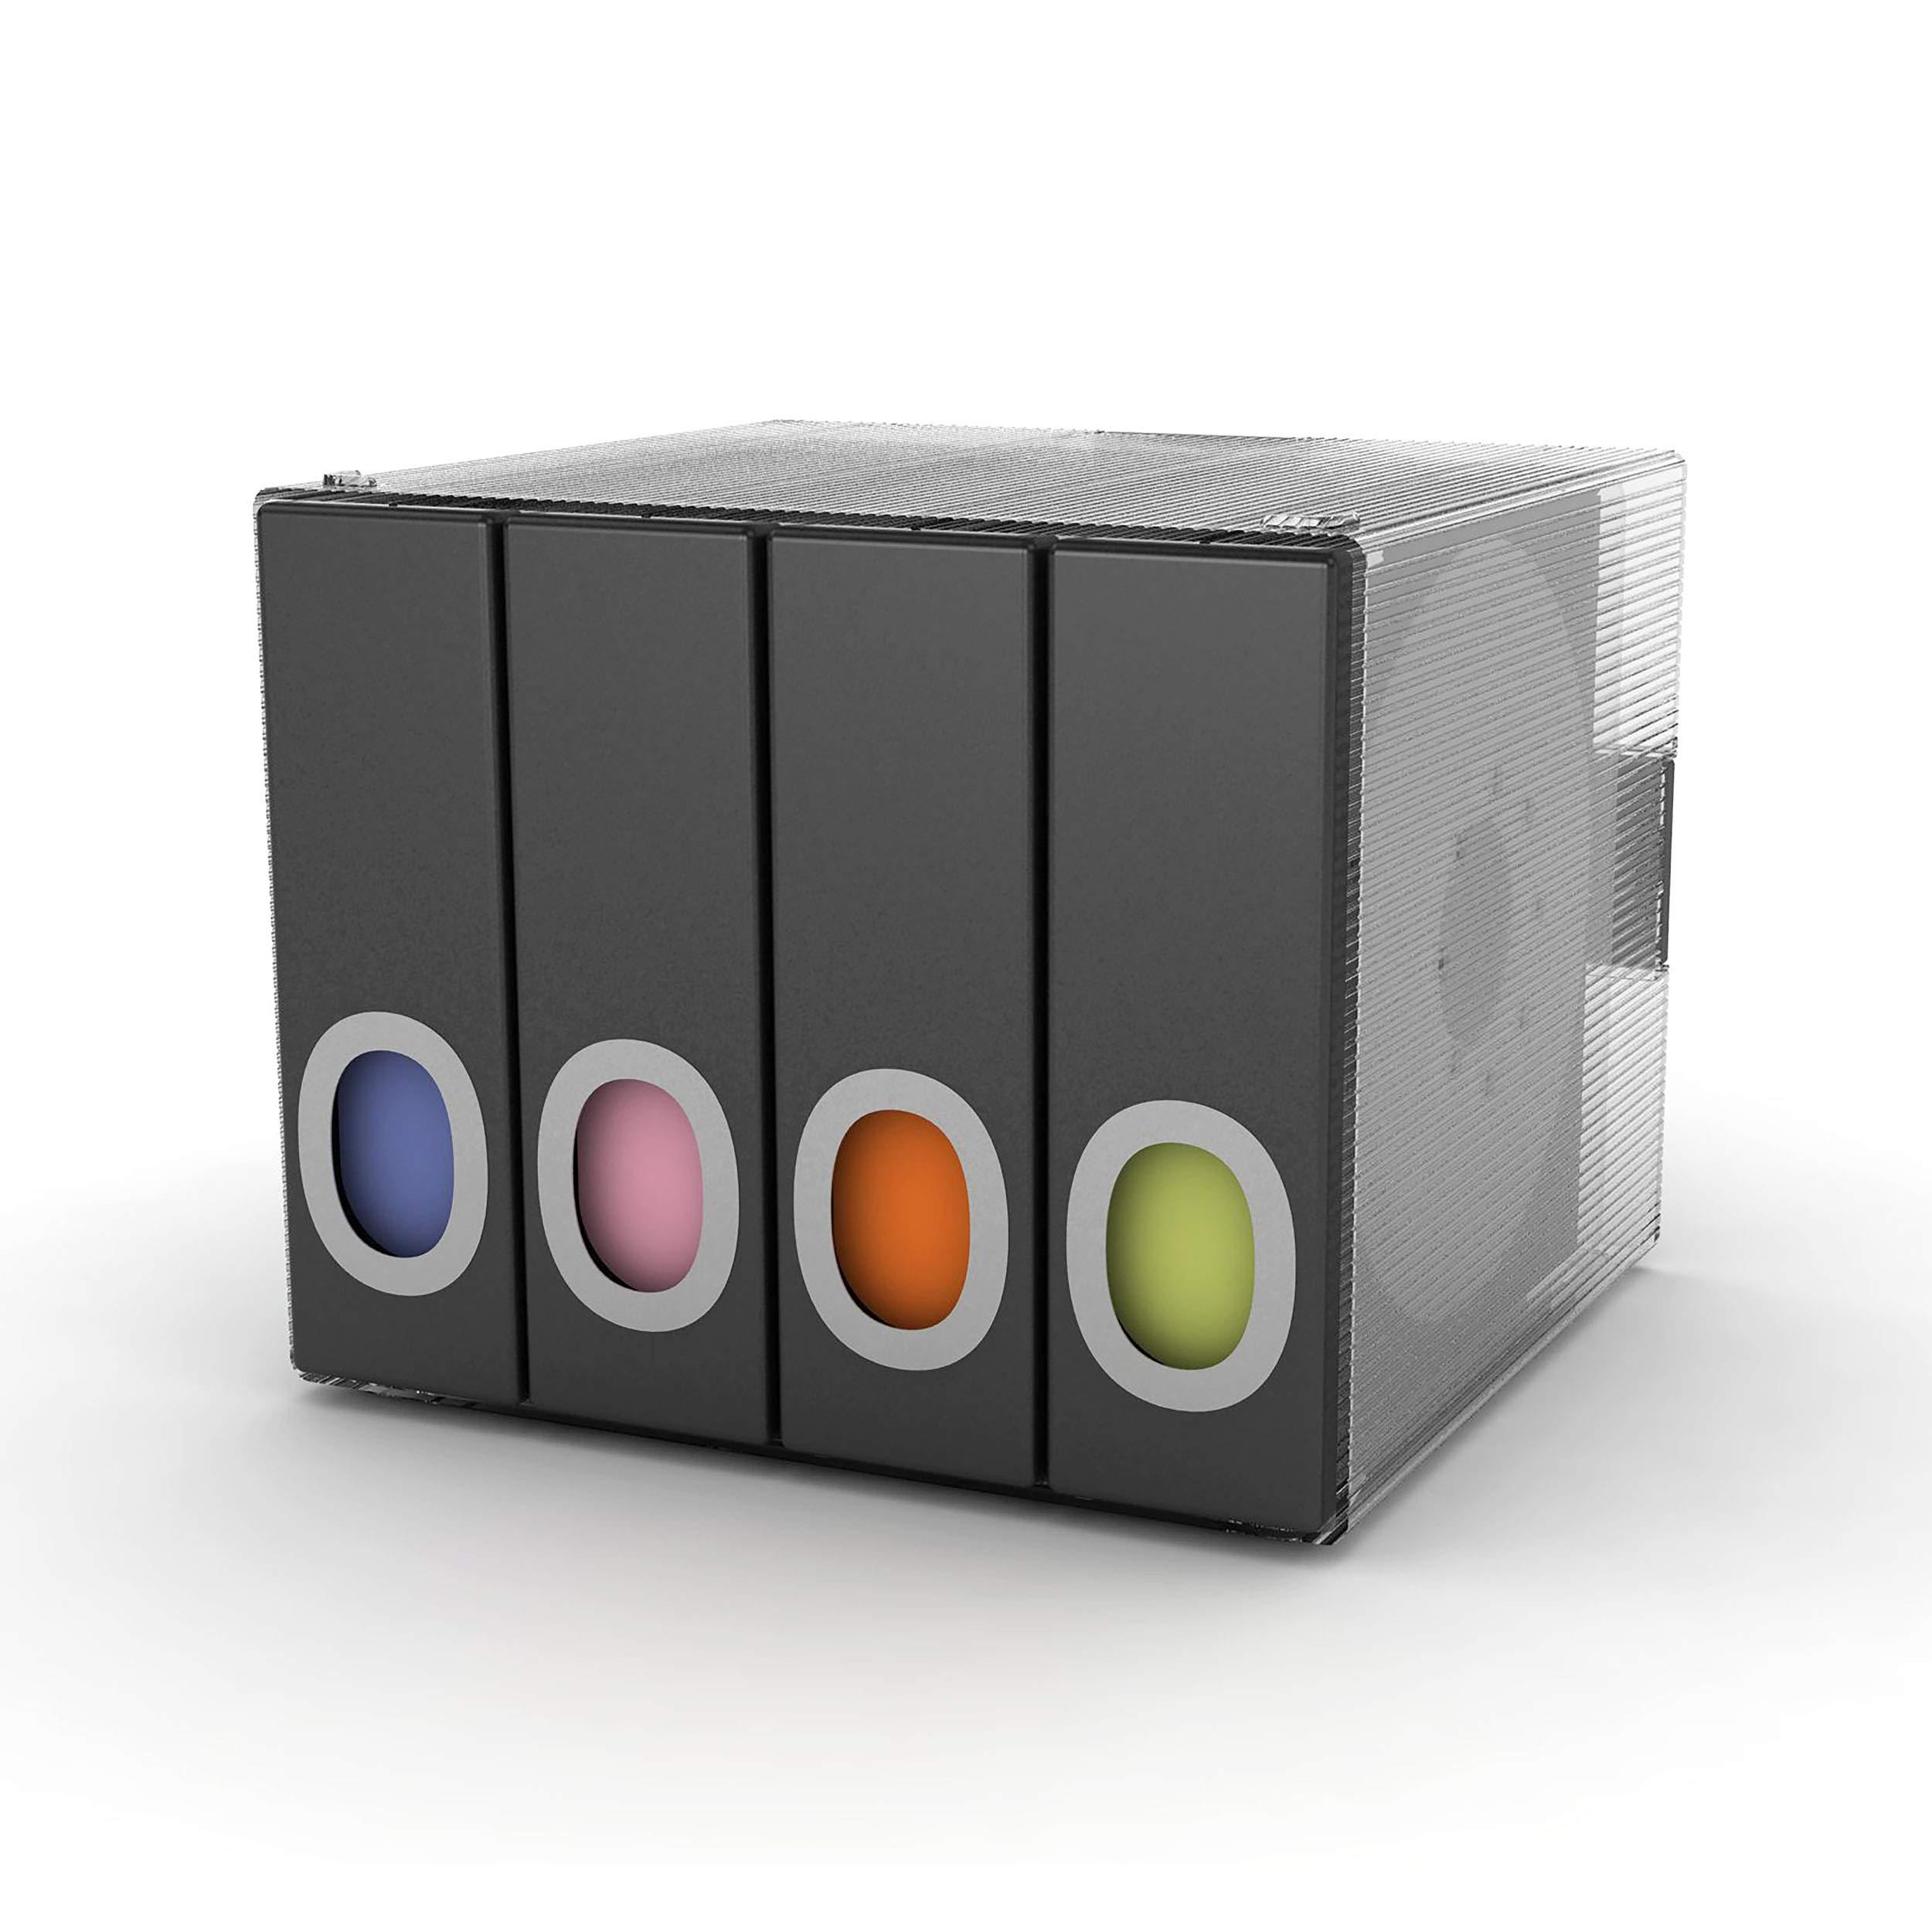 Atlantic Polypropylene Sleeve Disc Organizer - Stack & Lock, Categorize Cds In 4 Color-Coded Binders for 96 Discs Total In Black, PN96635496